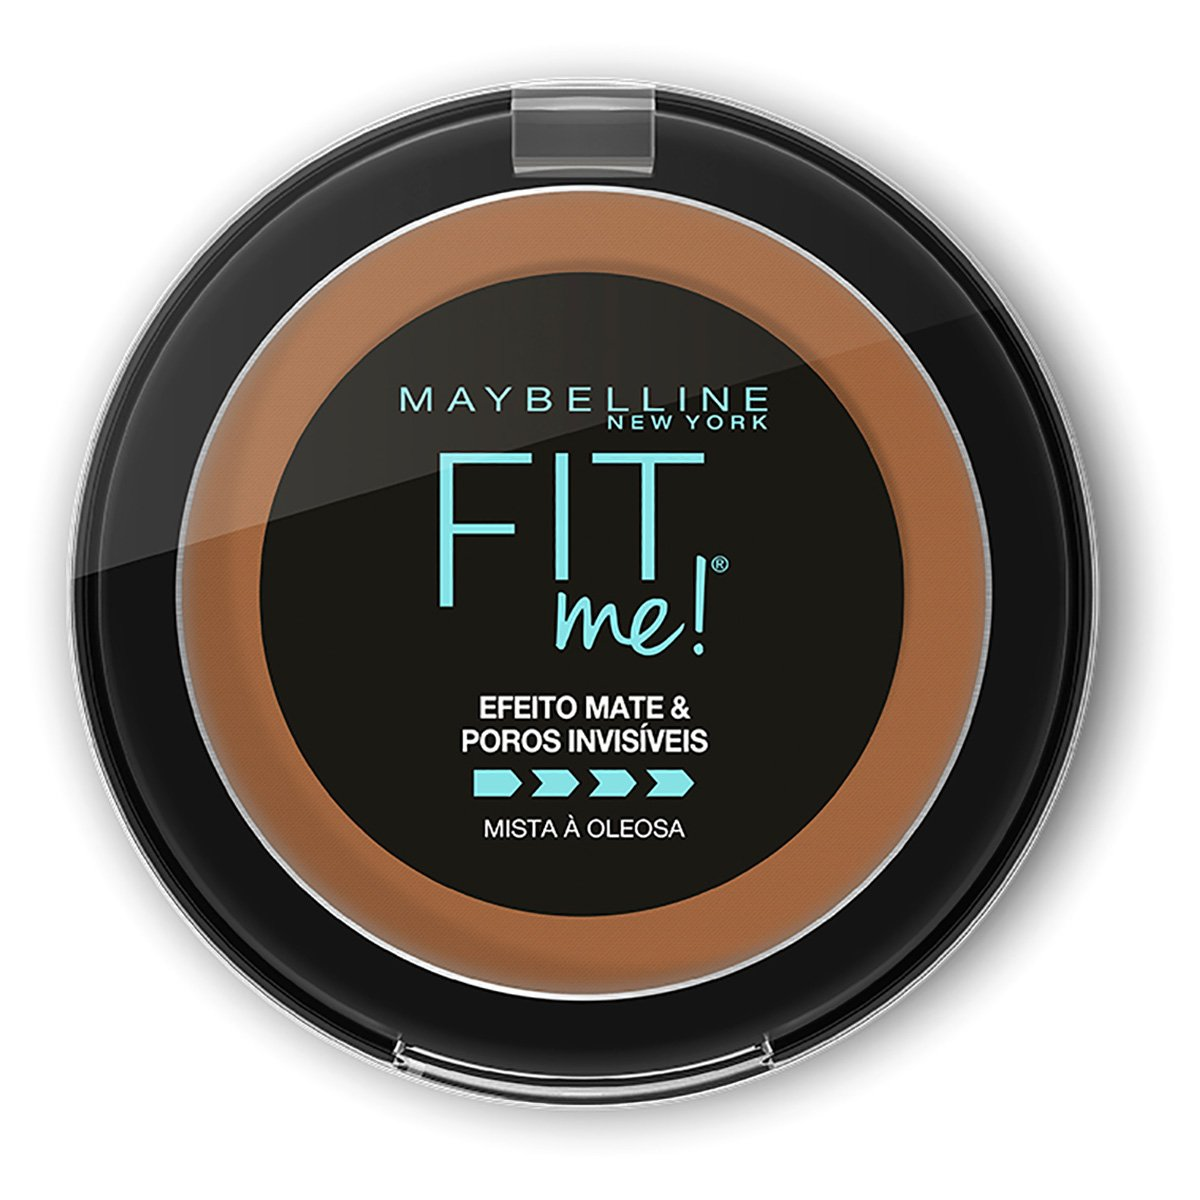 Pó compacto Maybelline Fit Me N10 Marrom Neutro